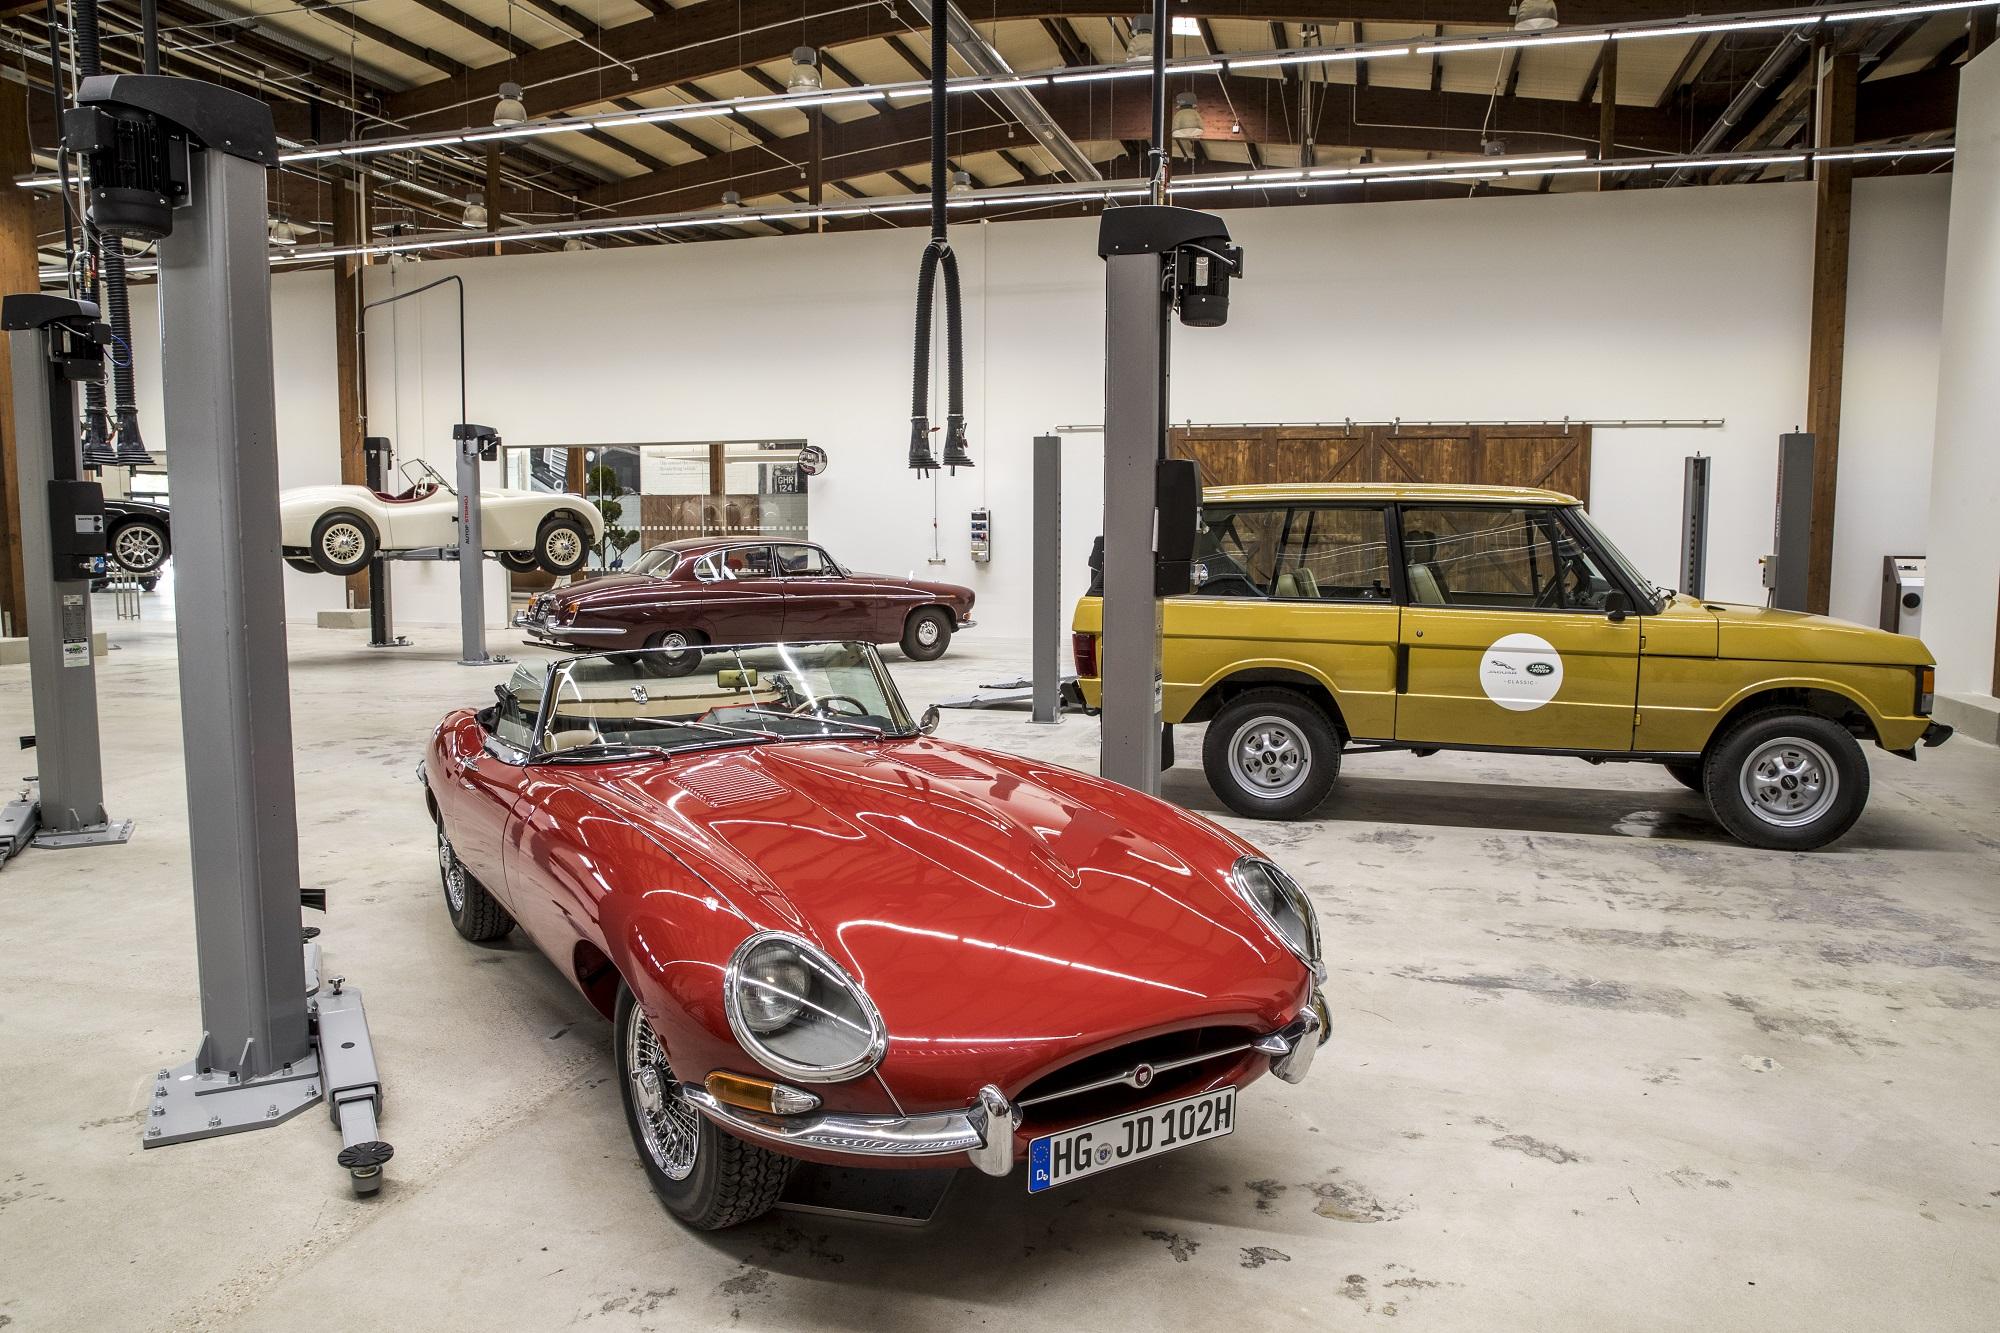 Jaguarforums.com Jaguar Land Rover Classic Restoration Business Expansion Germany